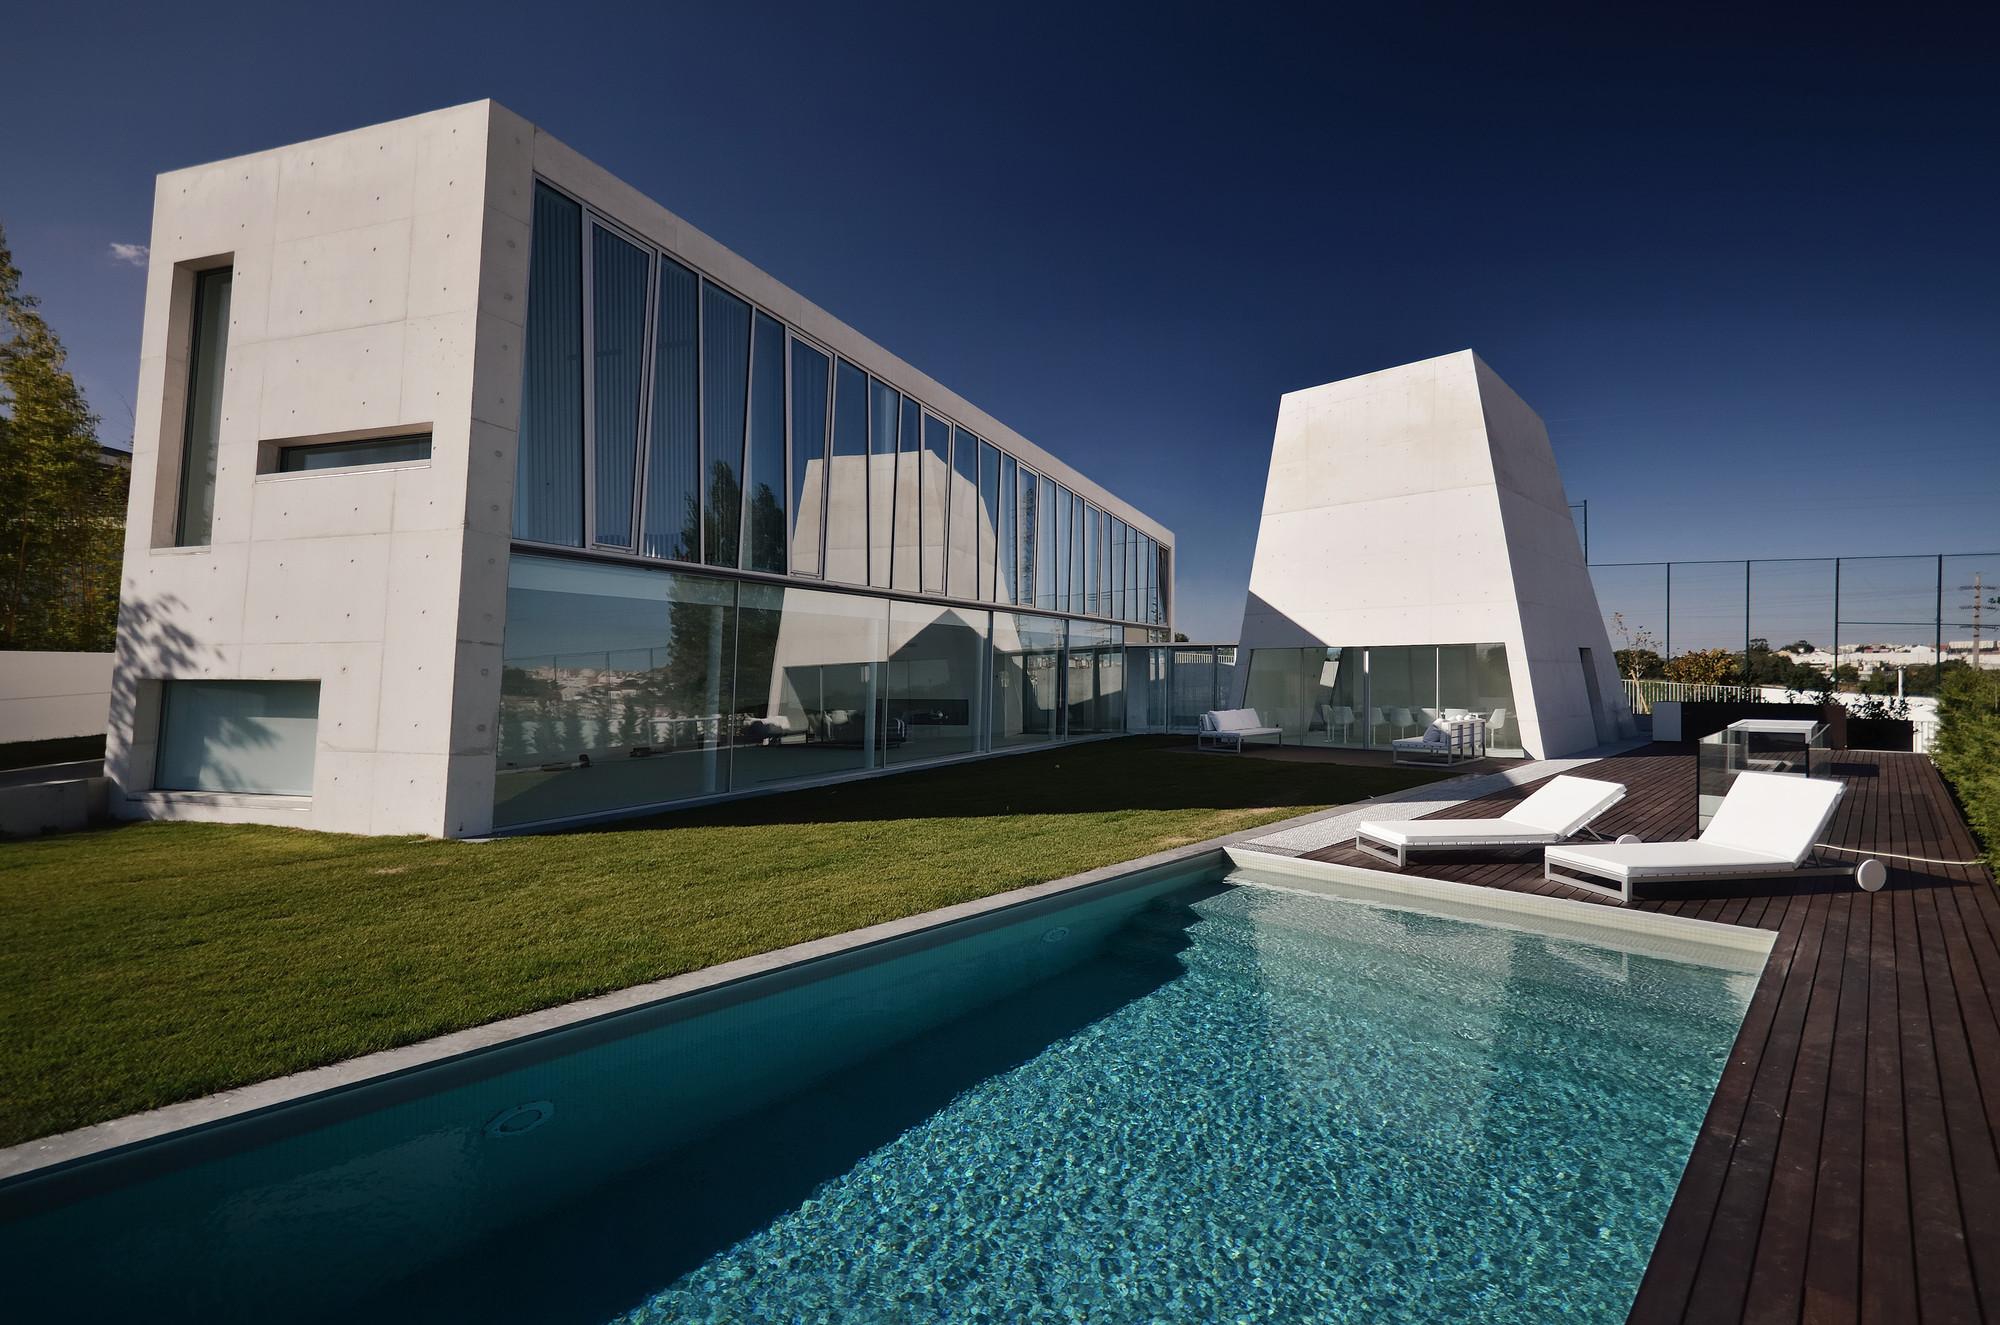 Galeria de casa alcoutins guedes cruz arquitectos 1 for Arquitectos para casas